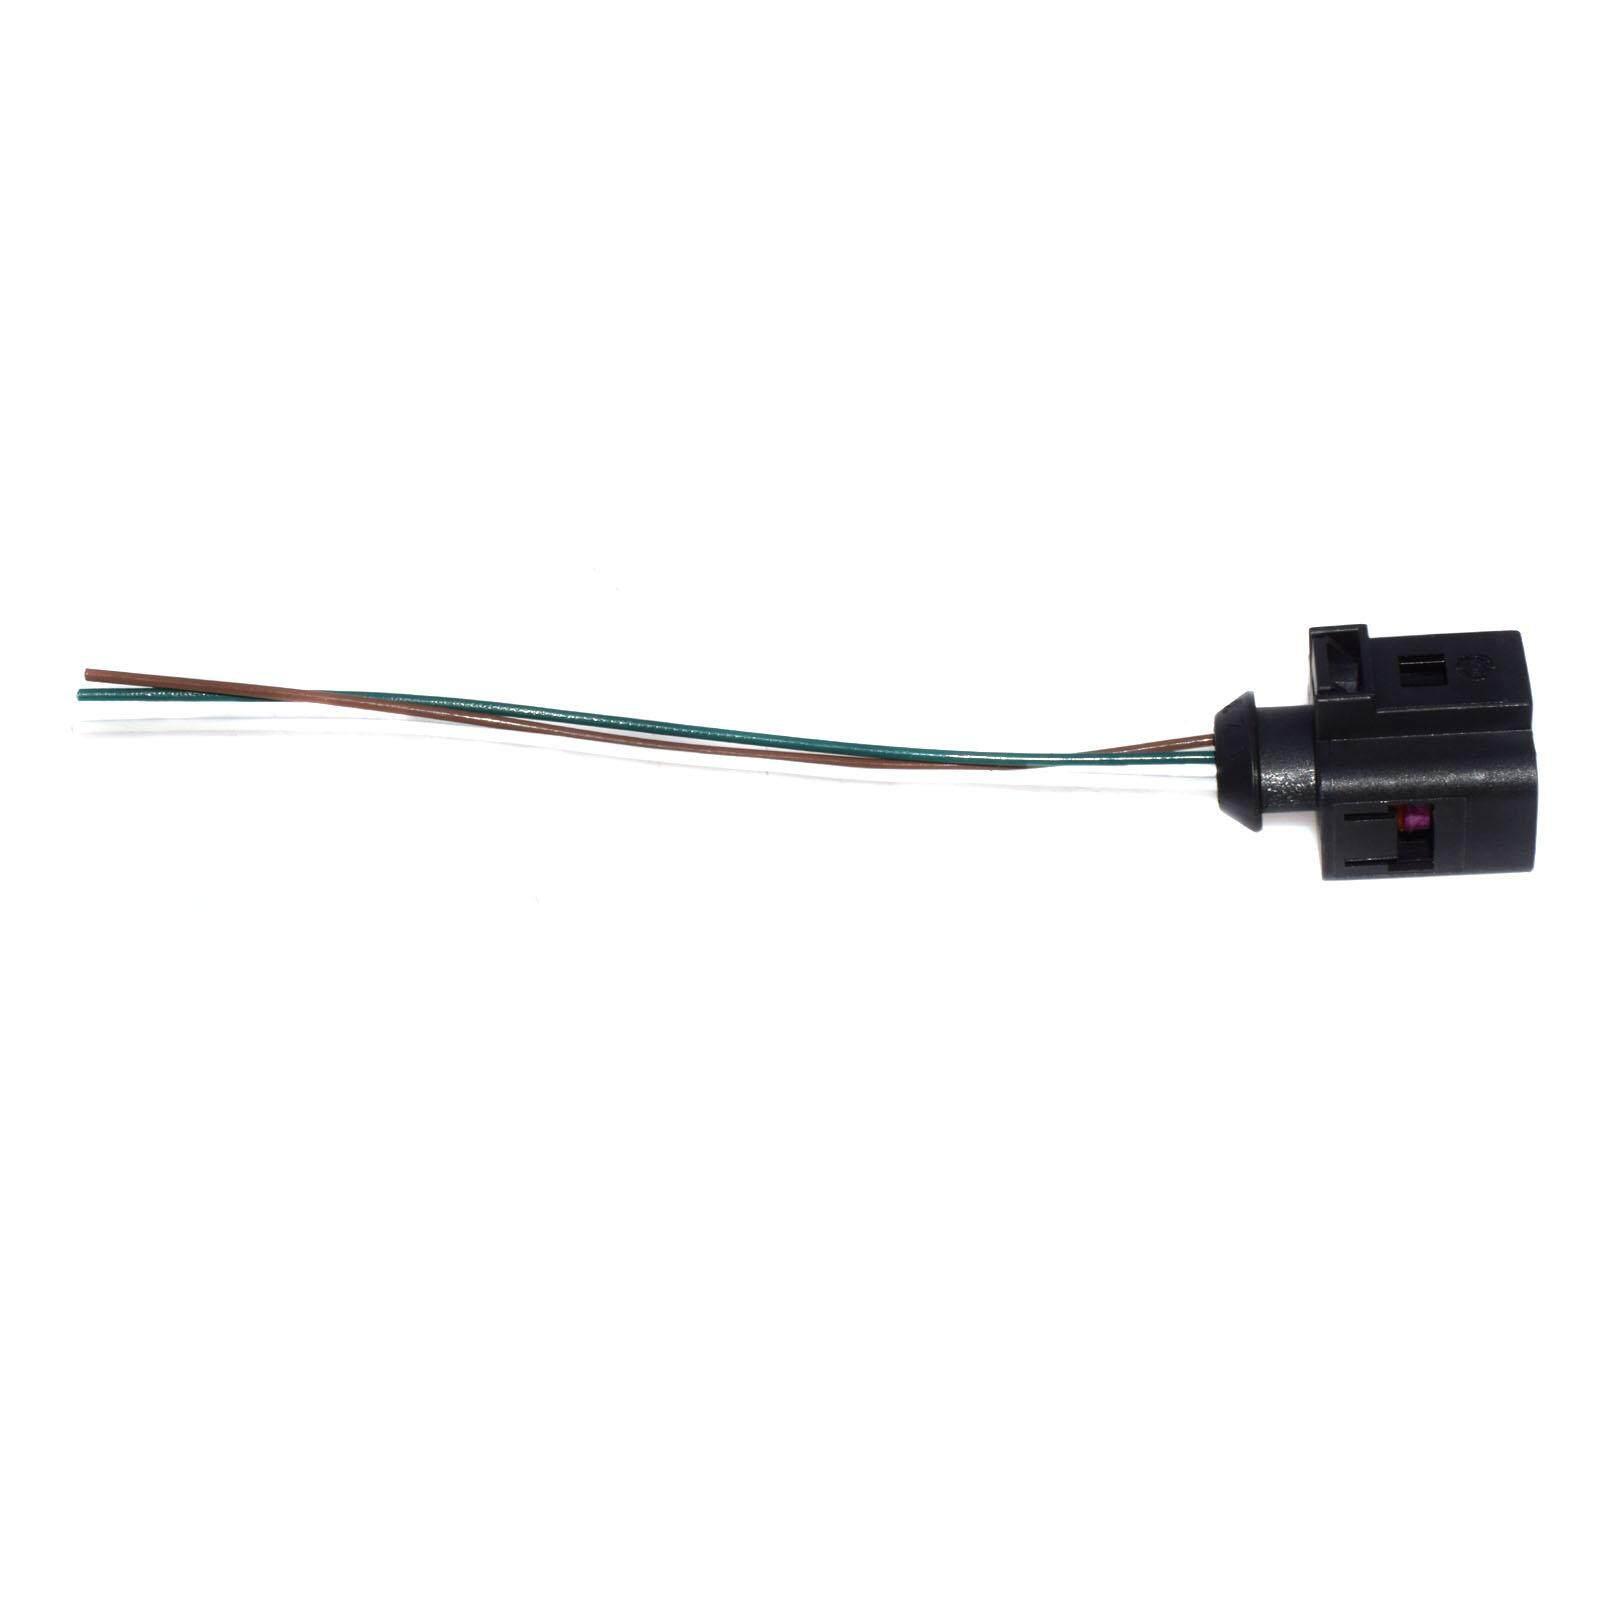 Baru 1 PC T-Ouareg Sensor Level Oli Plug Kabel Kawat Socket 3B0973703G untuk A6 C6 A4 B6 B7 Q7 TT A8 d3 Passat B5 B7 Cc